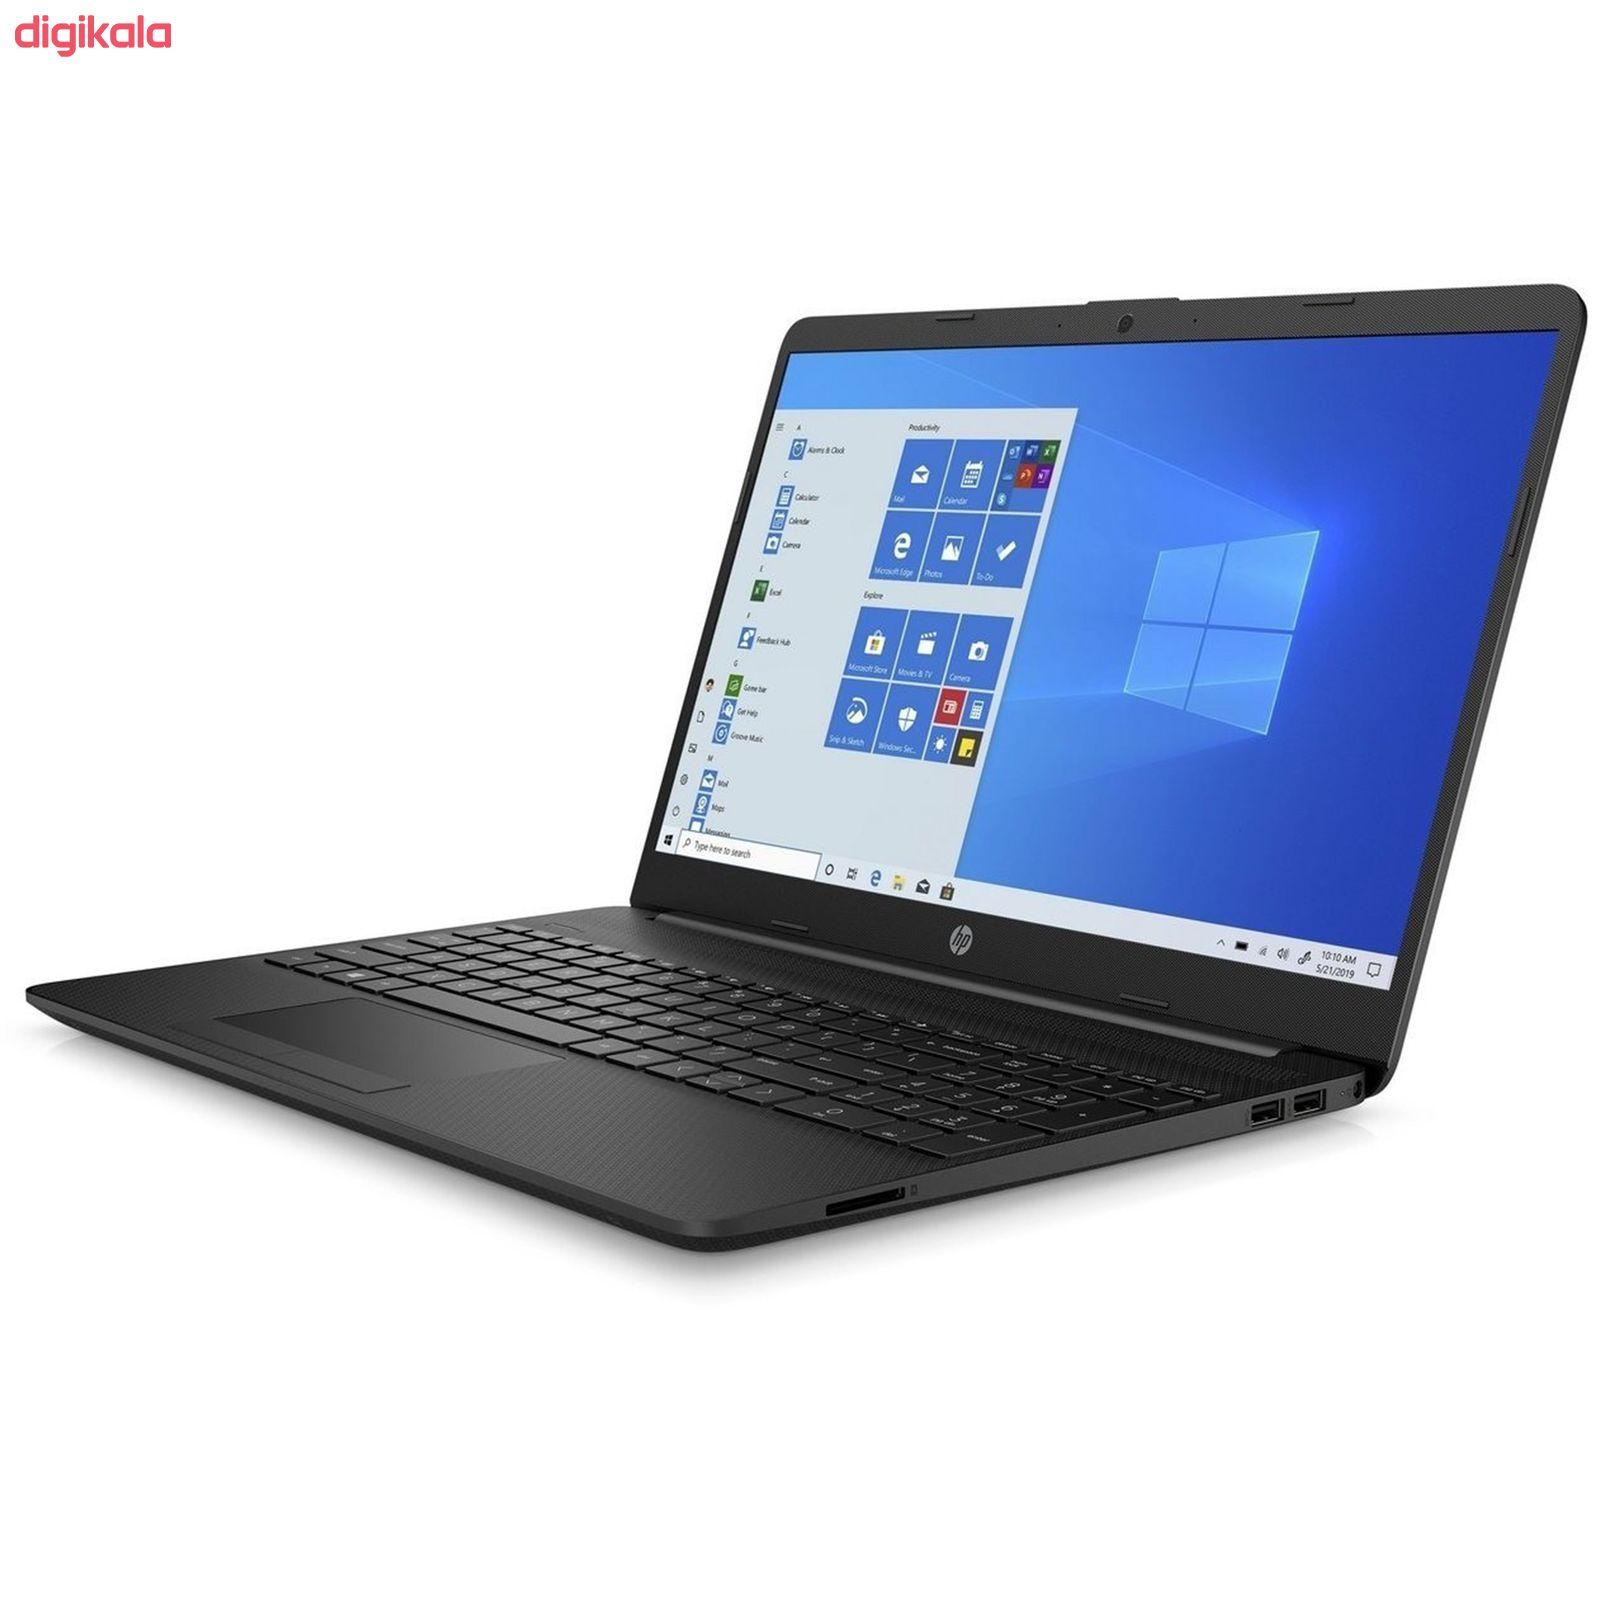 لپ تاپ 15.6 اینچی اچپی مدل DW2196-B